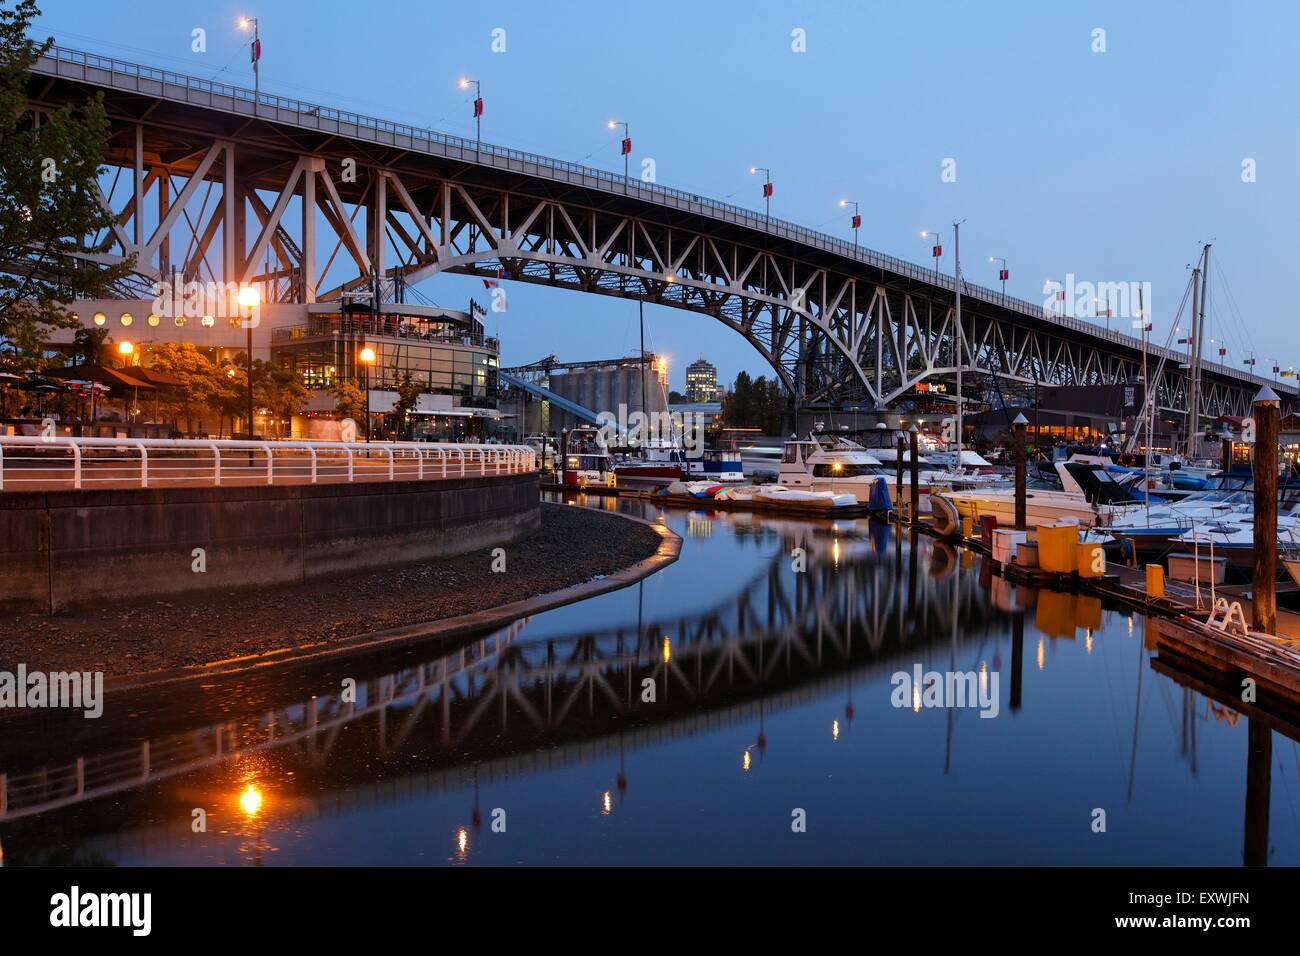 Promande and small Marina at False Creek at twilight, Vancouver, Canada - Stock Image